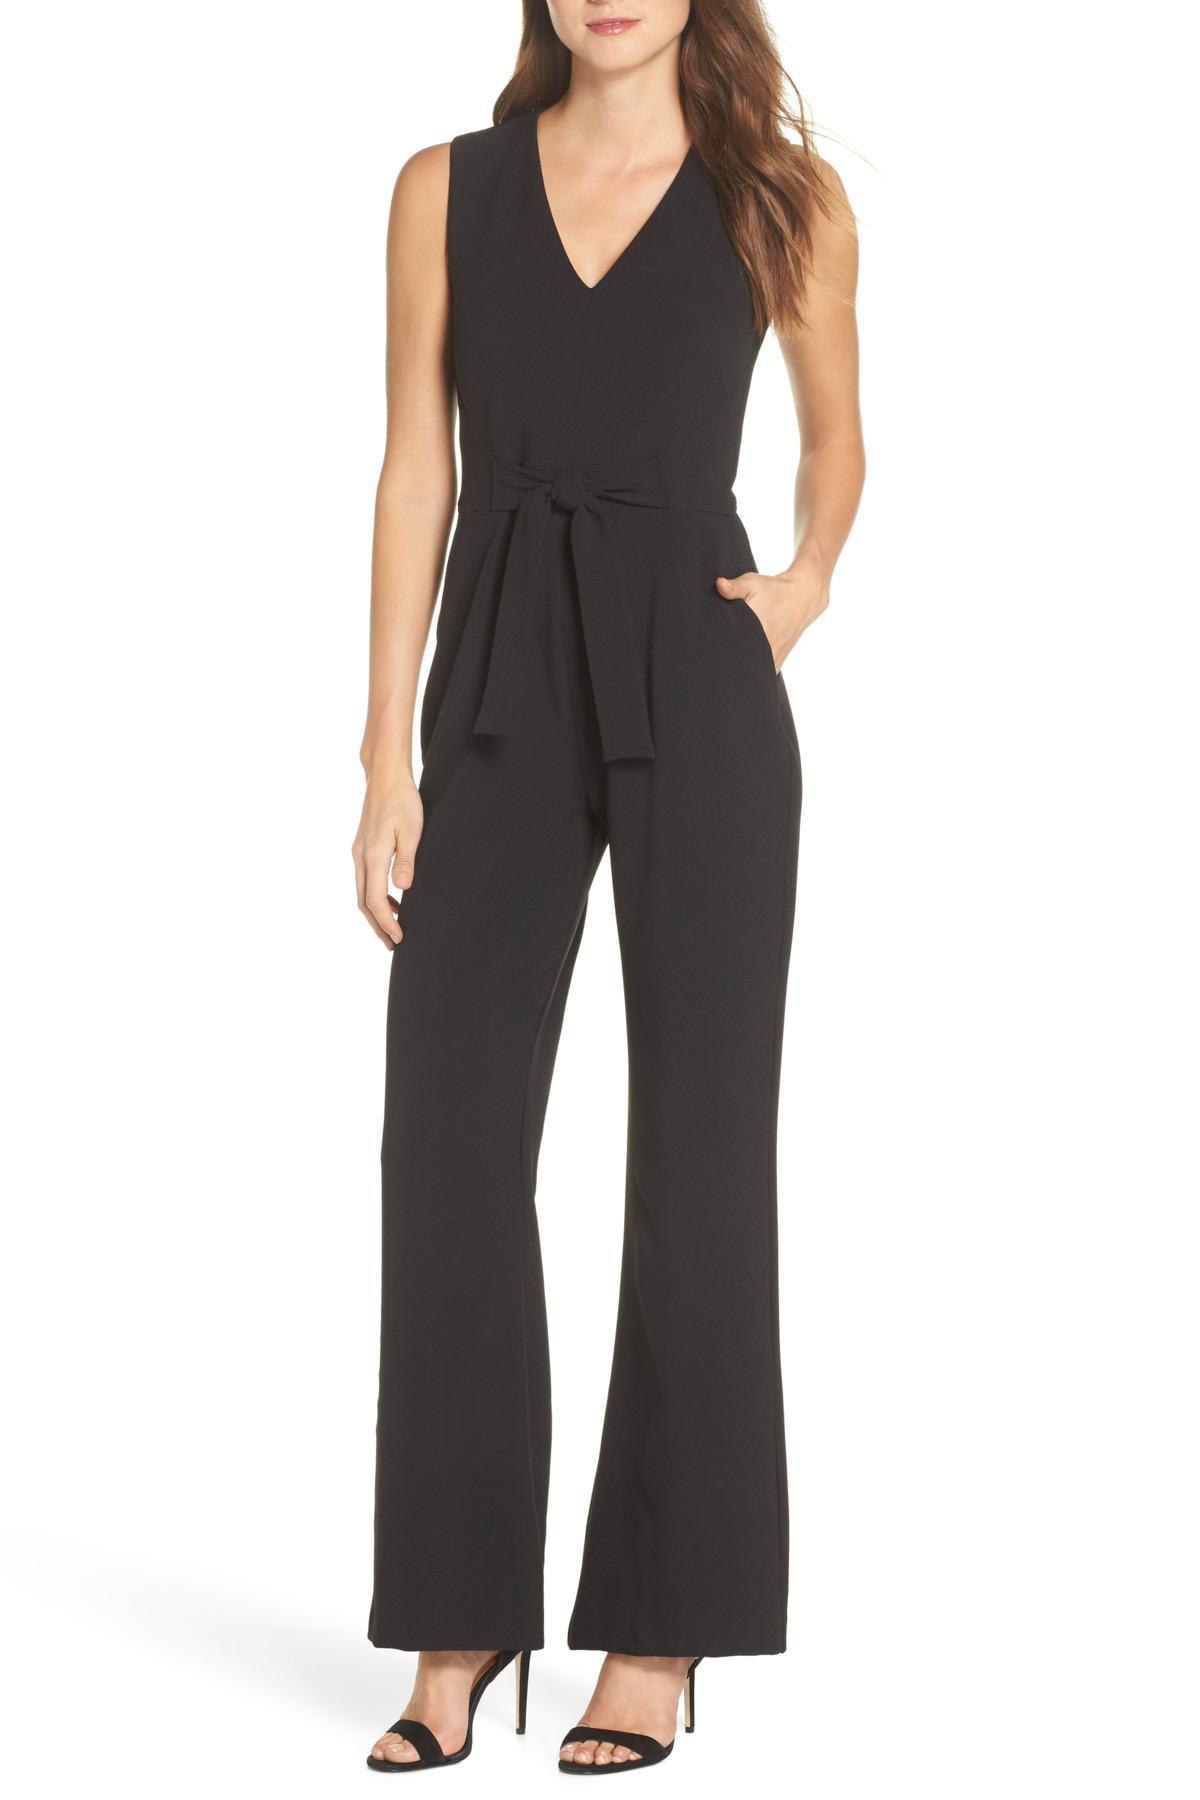 70575b942642 Lyst - Vince Camuto Tie Waist Crepe Jumpsuit in Black - Save 60%